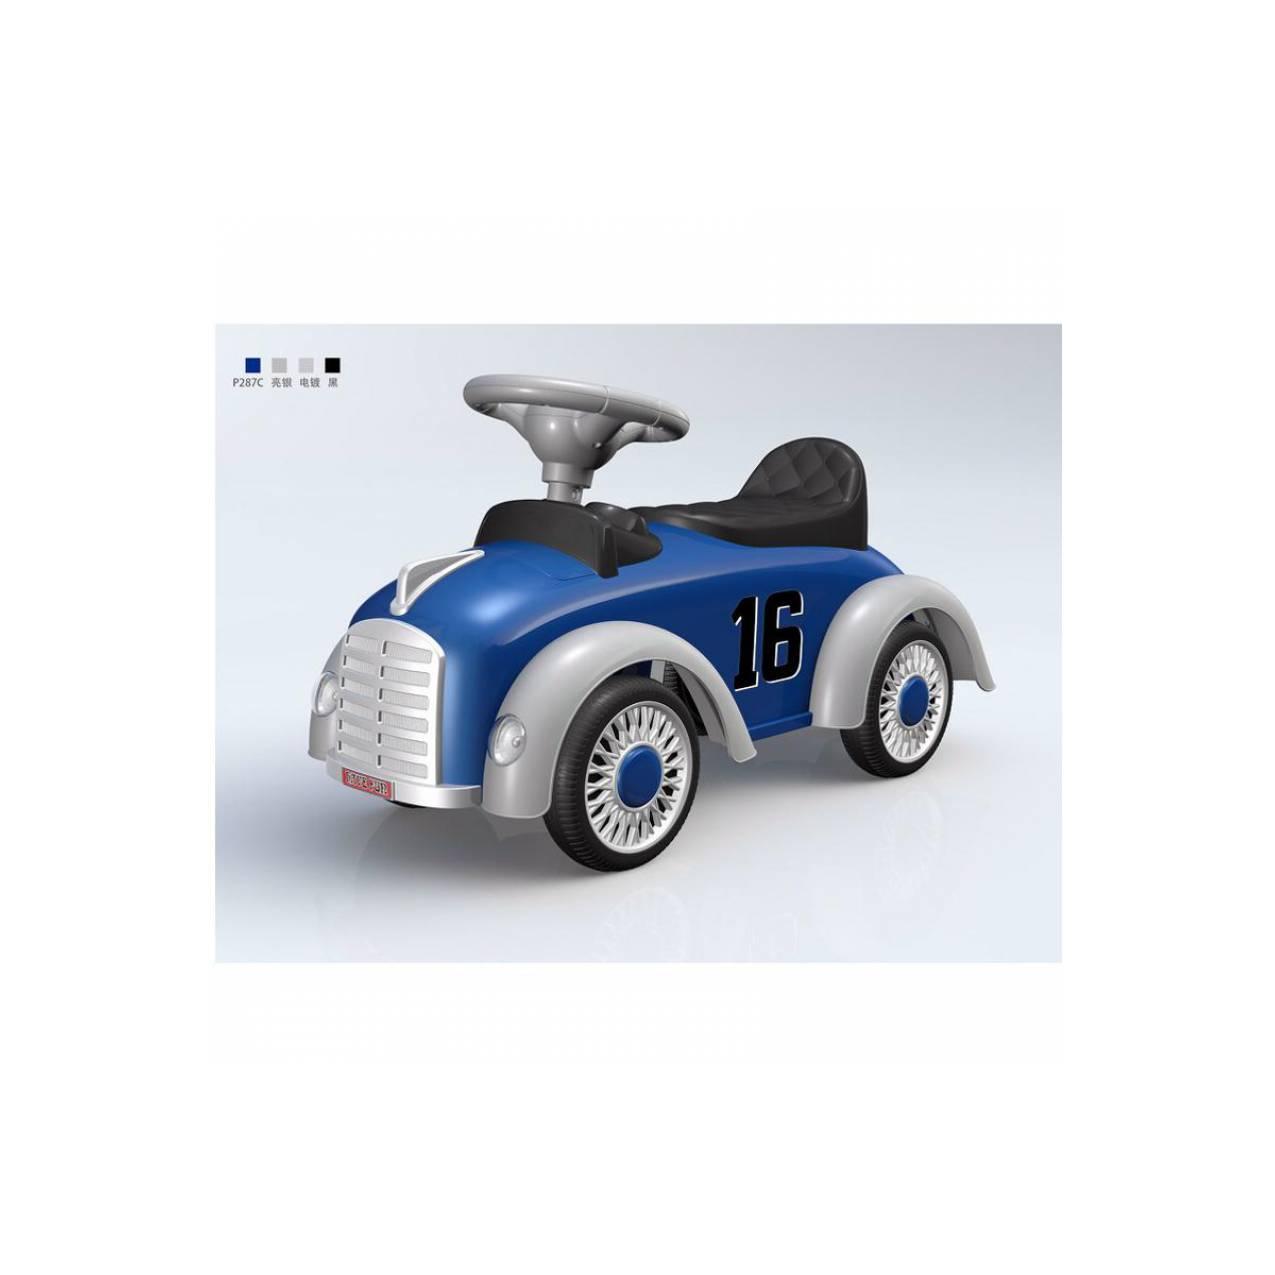 Ride On Pliko 539 Race Car Blue